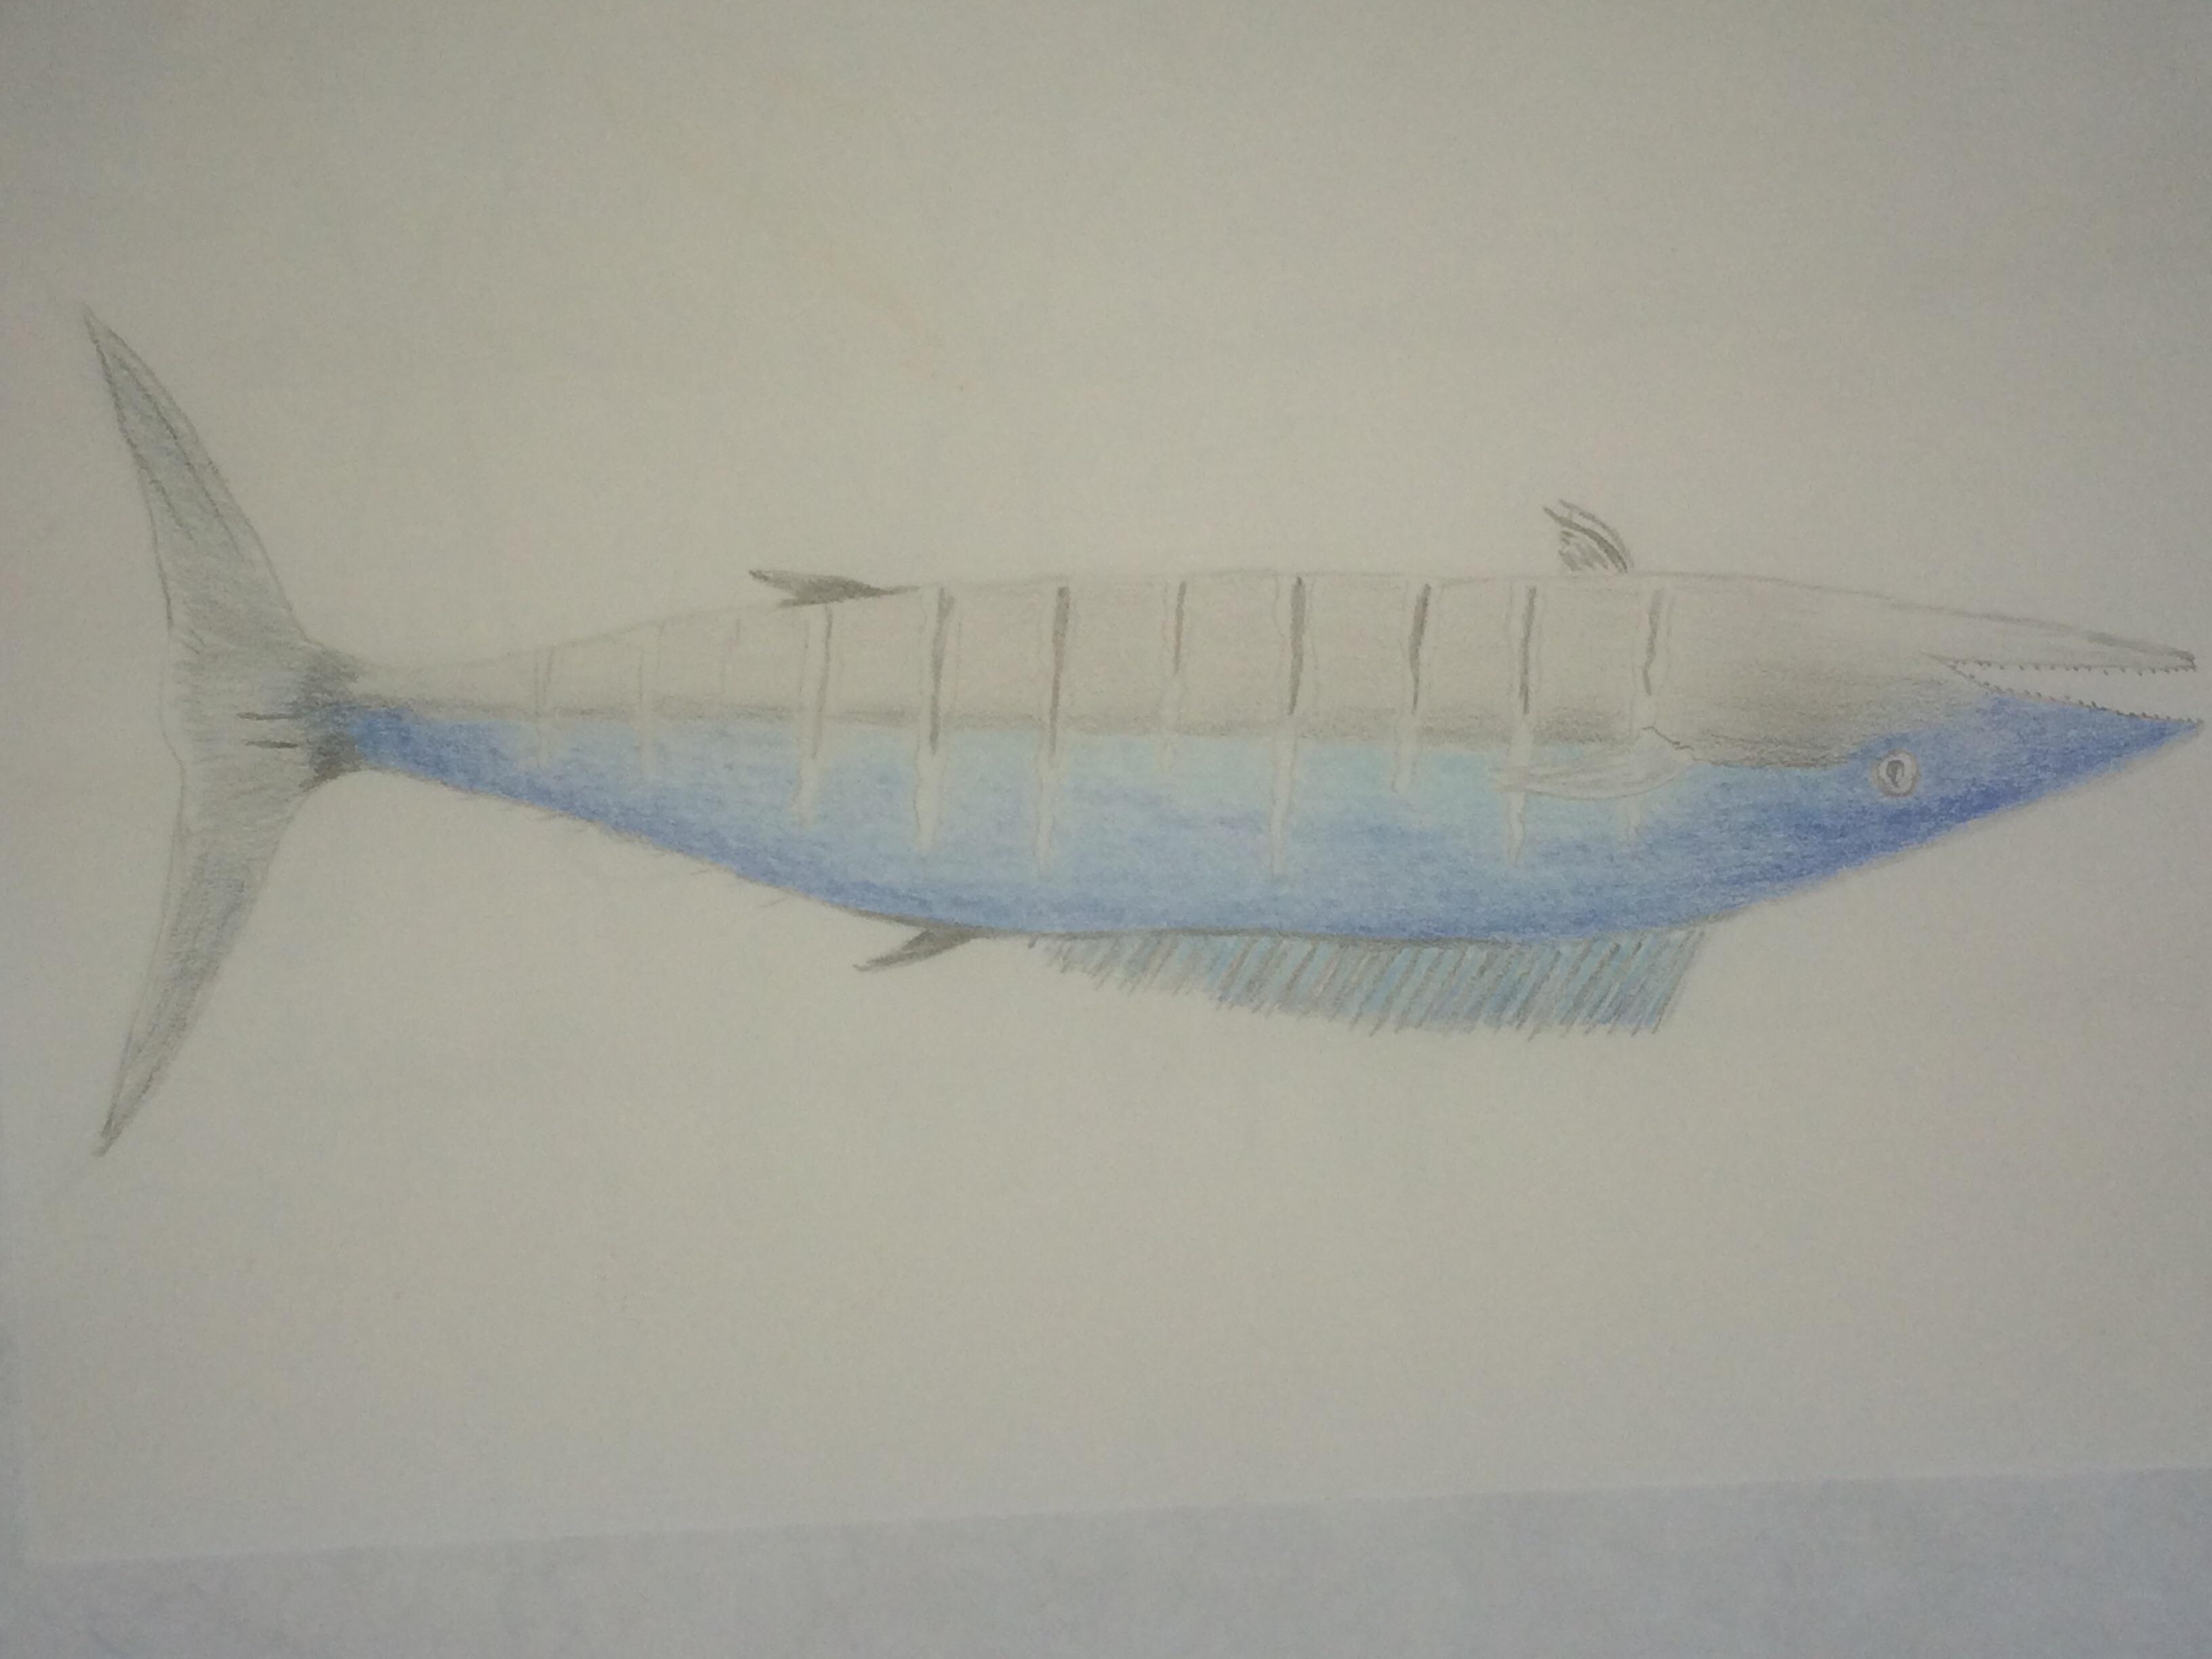 Ono fish